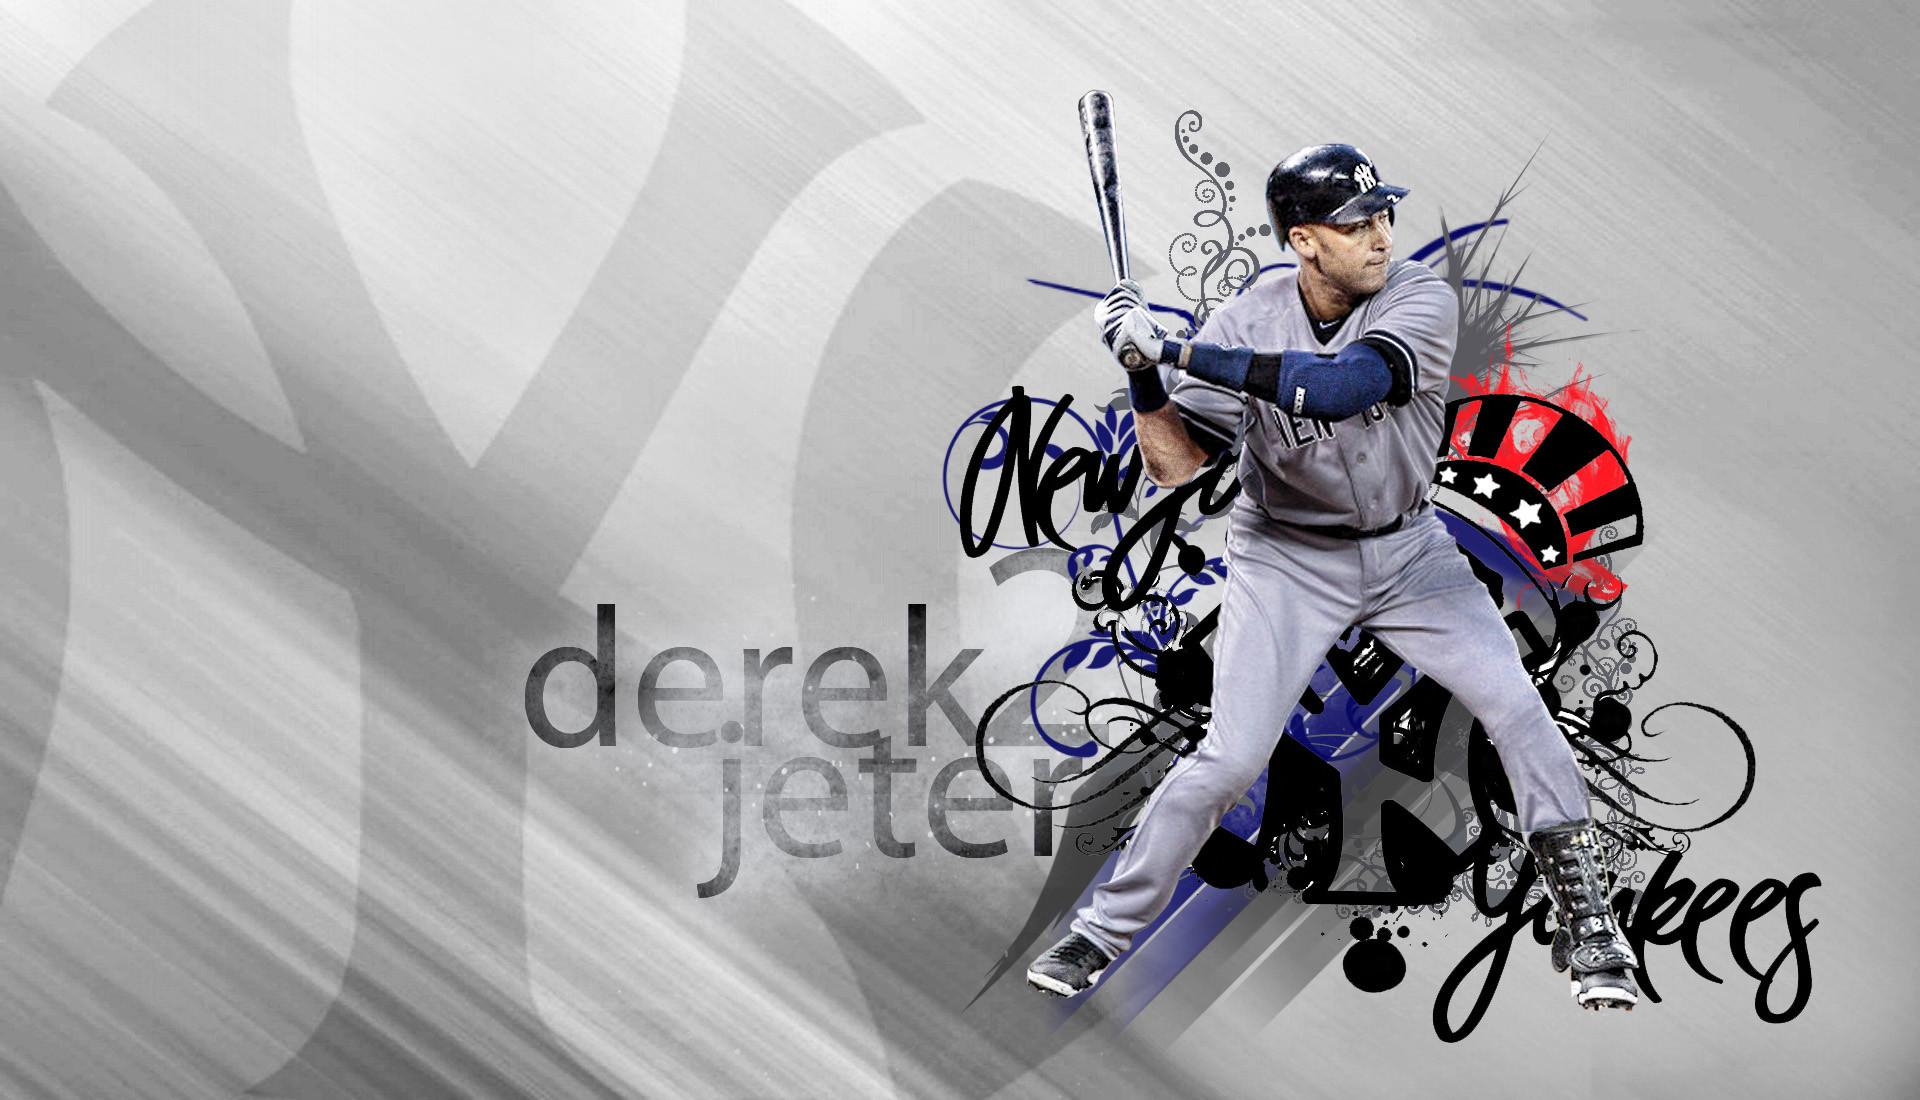 Derek Jeter New York Yankees Wallpaper.